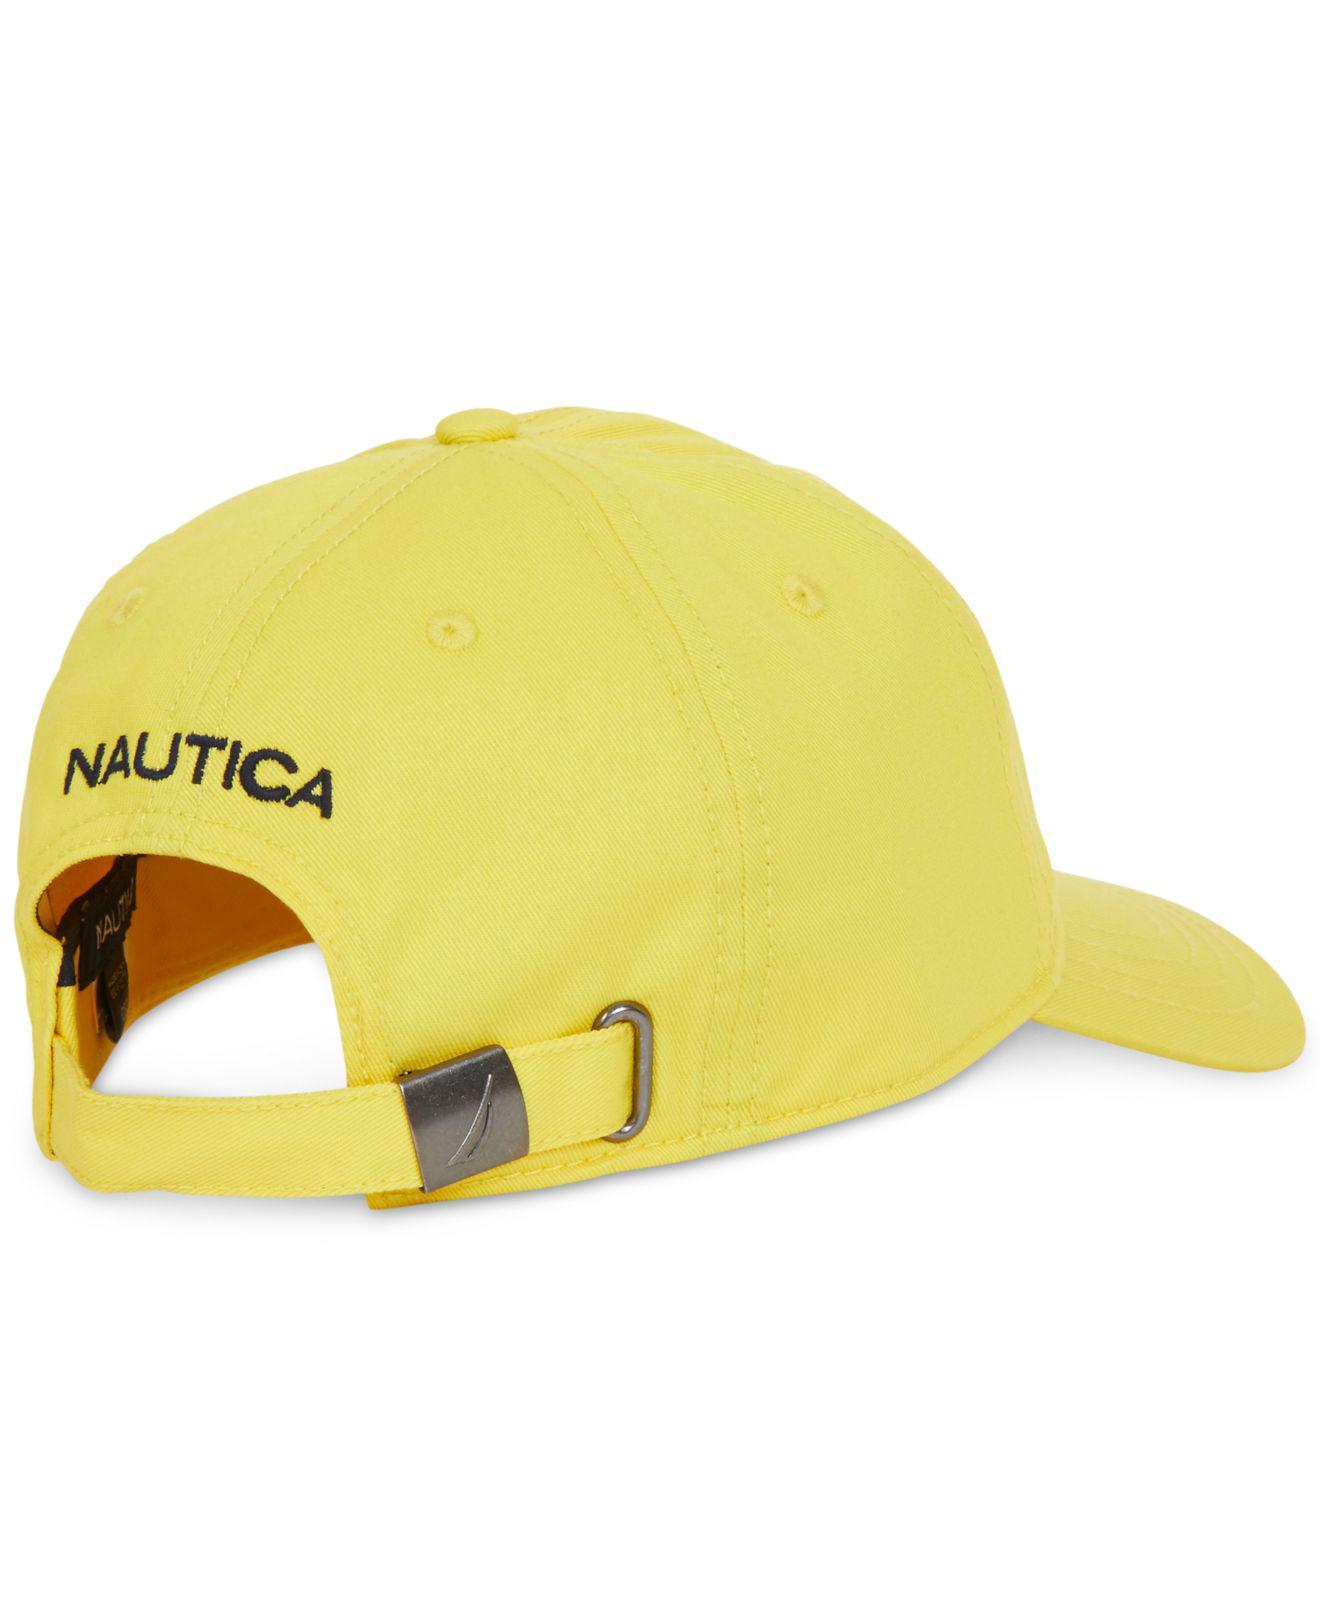 Lyst - Nautica Baseball Hat in Yellow for Men b1167348285